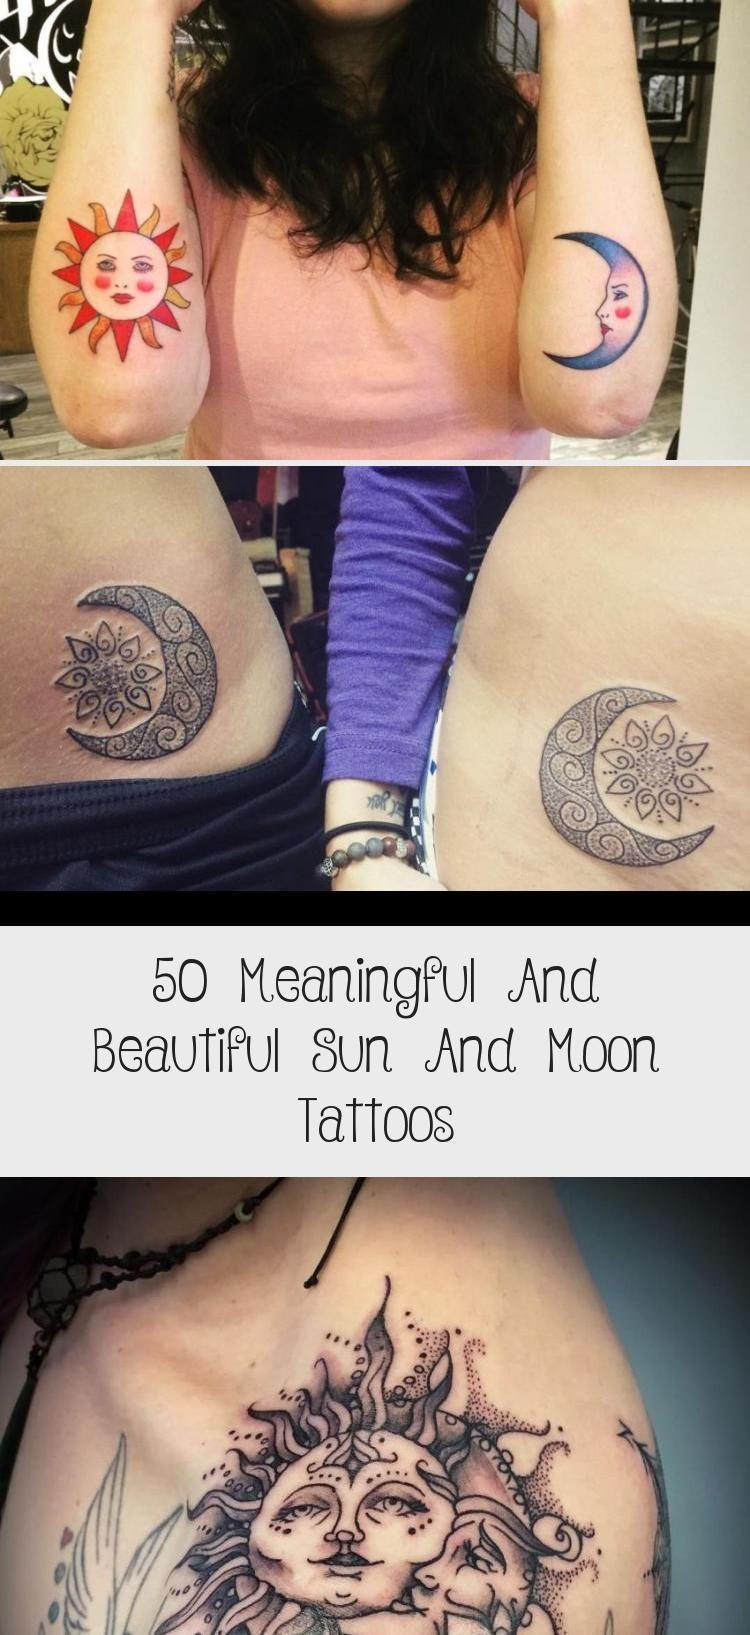 Ornamental Sun And Moon Tattoo Ideas C Eloise Entraigues Thighta Ornamental Sun And Moon Tattoo Ideas C Eloise Tattoos Moon Tattoo Unusual Tattoo